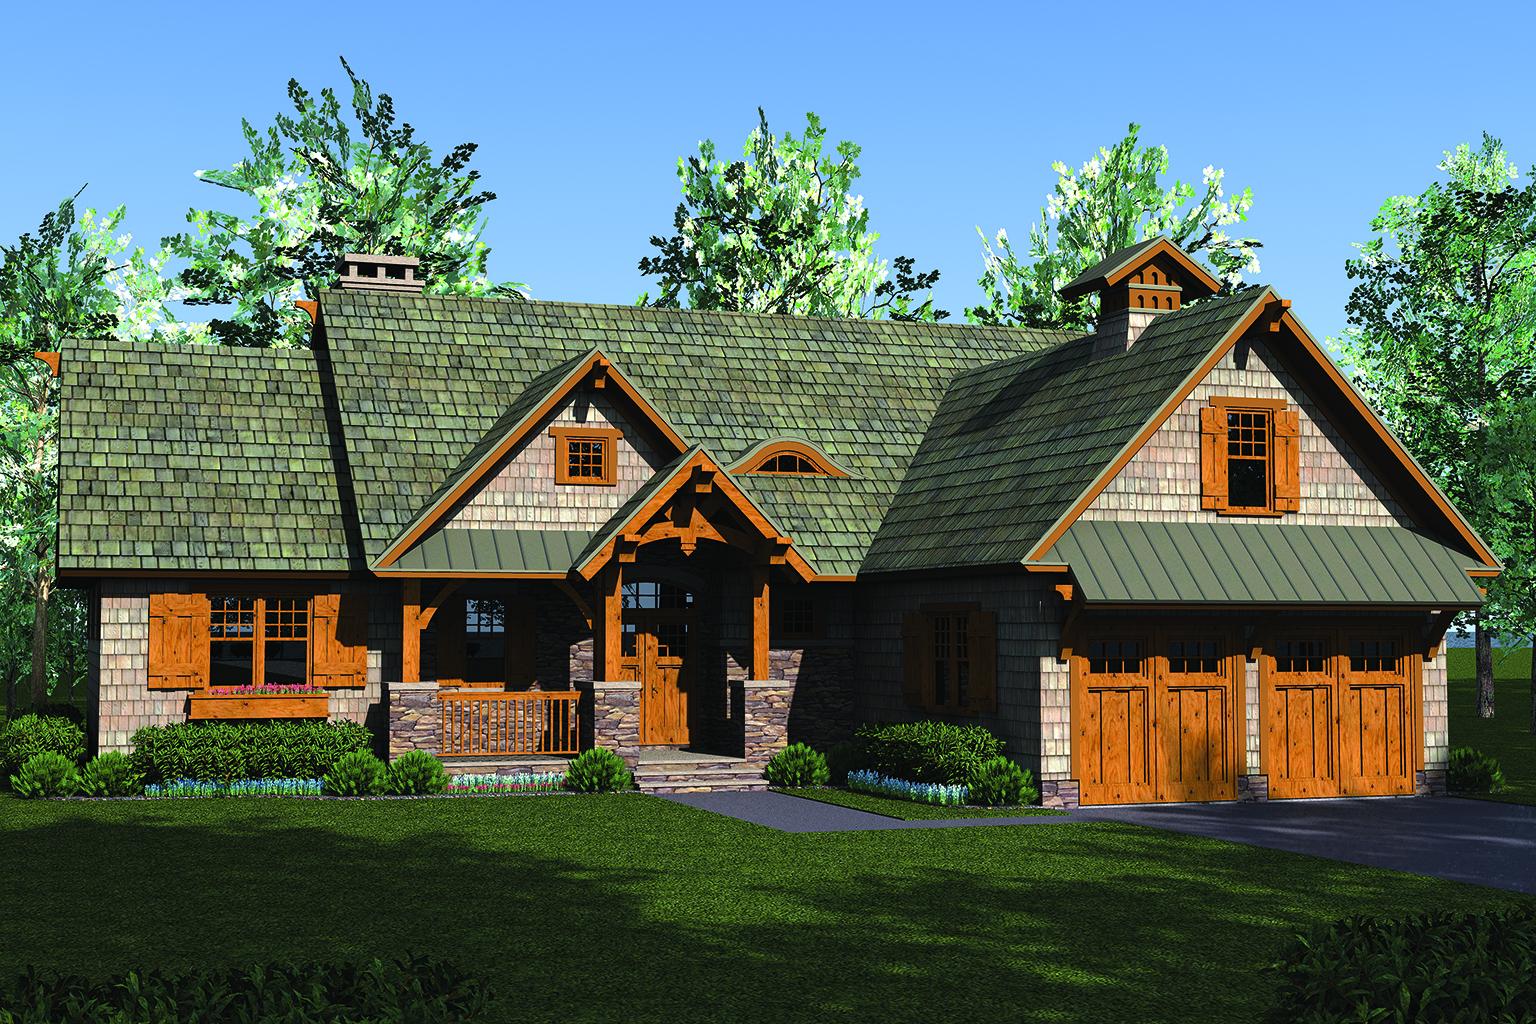 Craftsman House Plan #180-1049: 3 Bedrm, 2074 Sq Ft Home